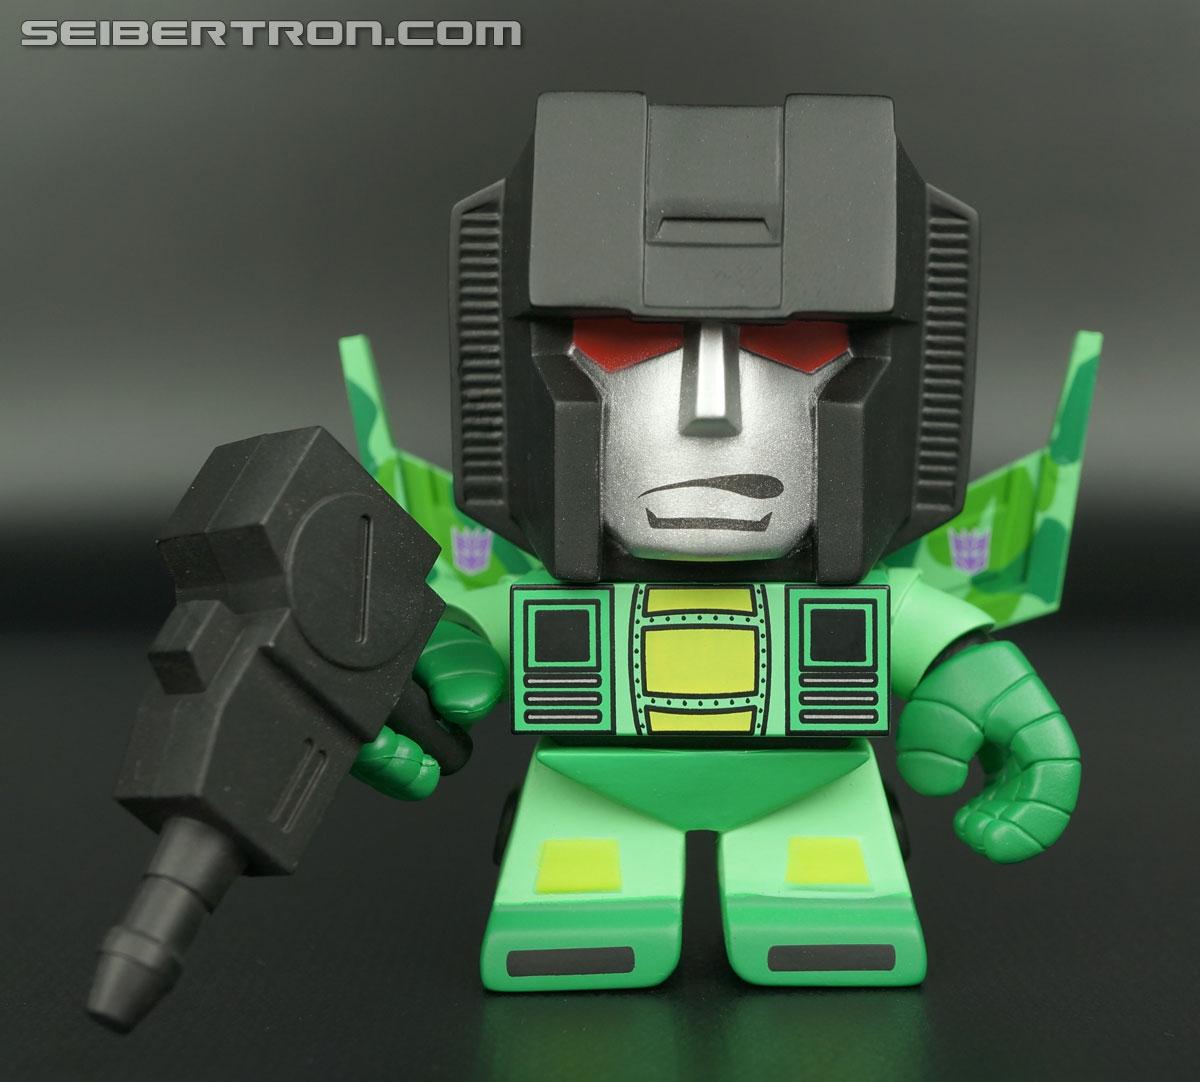 Transformers Loyal Subjects Rainmaker (Green) (Acid Storm) (Image #14 of 40)